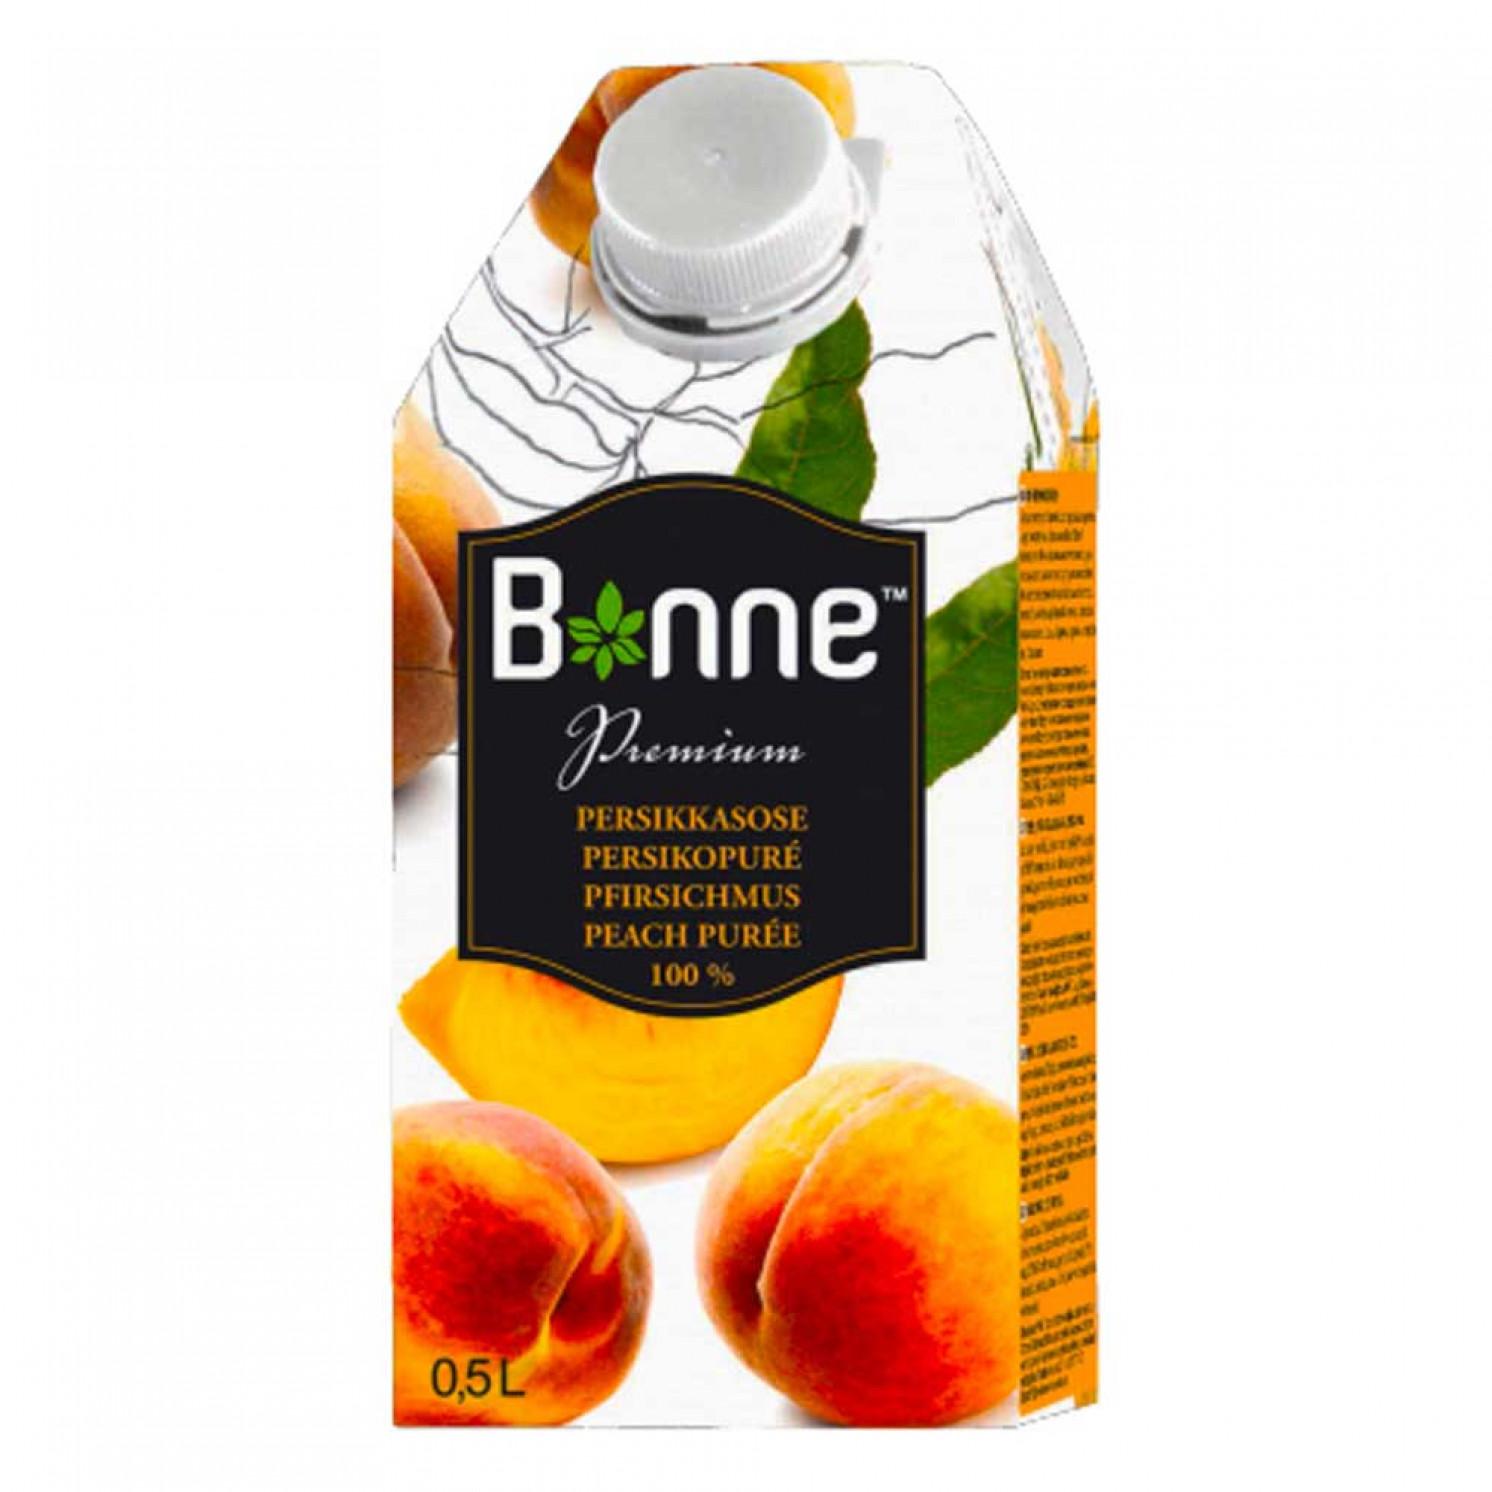 Персиковое пюре Bonne 0,5 л